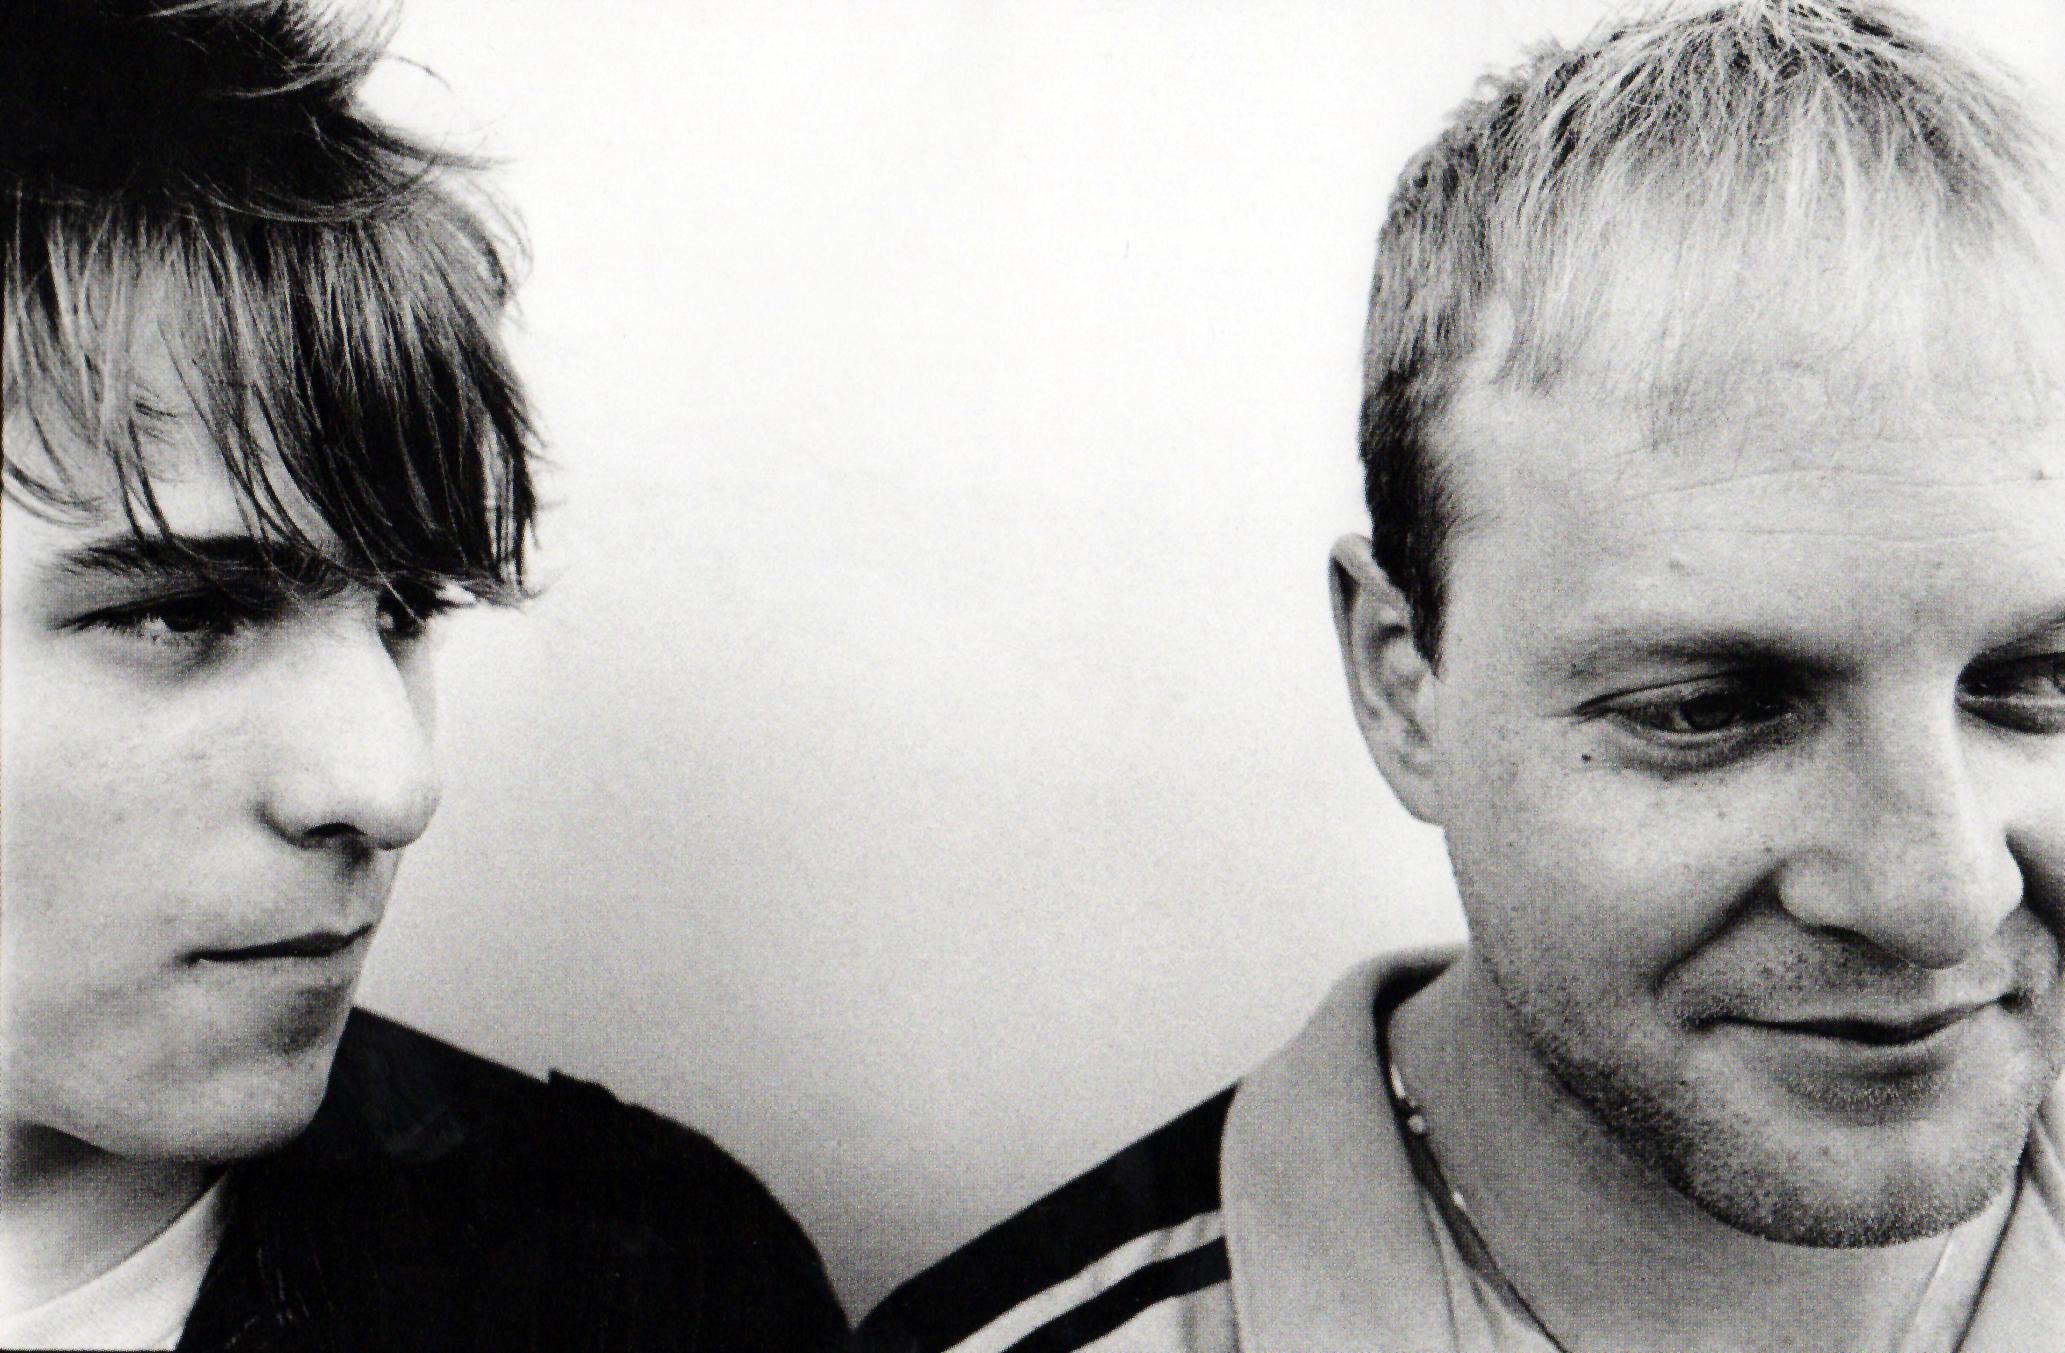 Bob and Tommy Stinson, 1983. Photo by Daniel Corrigan.